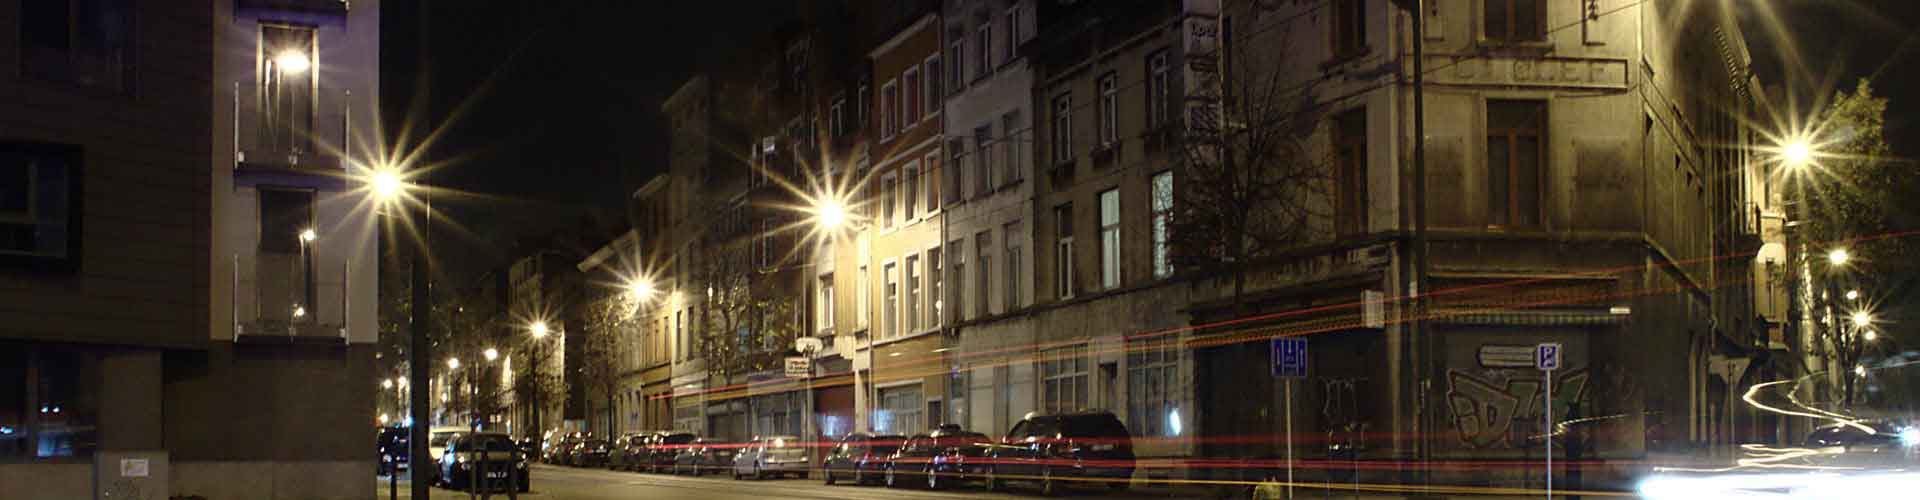 Bruxelles – Ostelli nella zona  Molenbeek-Saint-Jean. Mappe per Bruxelles, Foto e Recensioni per ogni Ostello a Bruxelles.